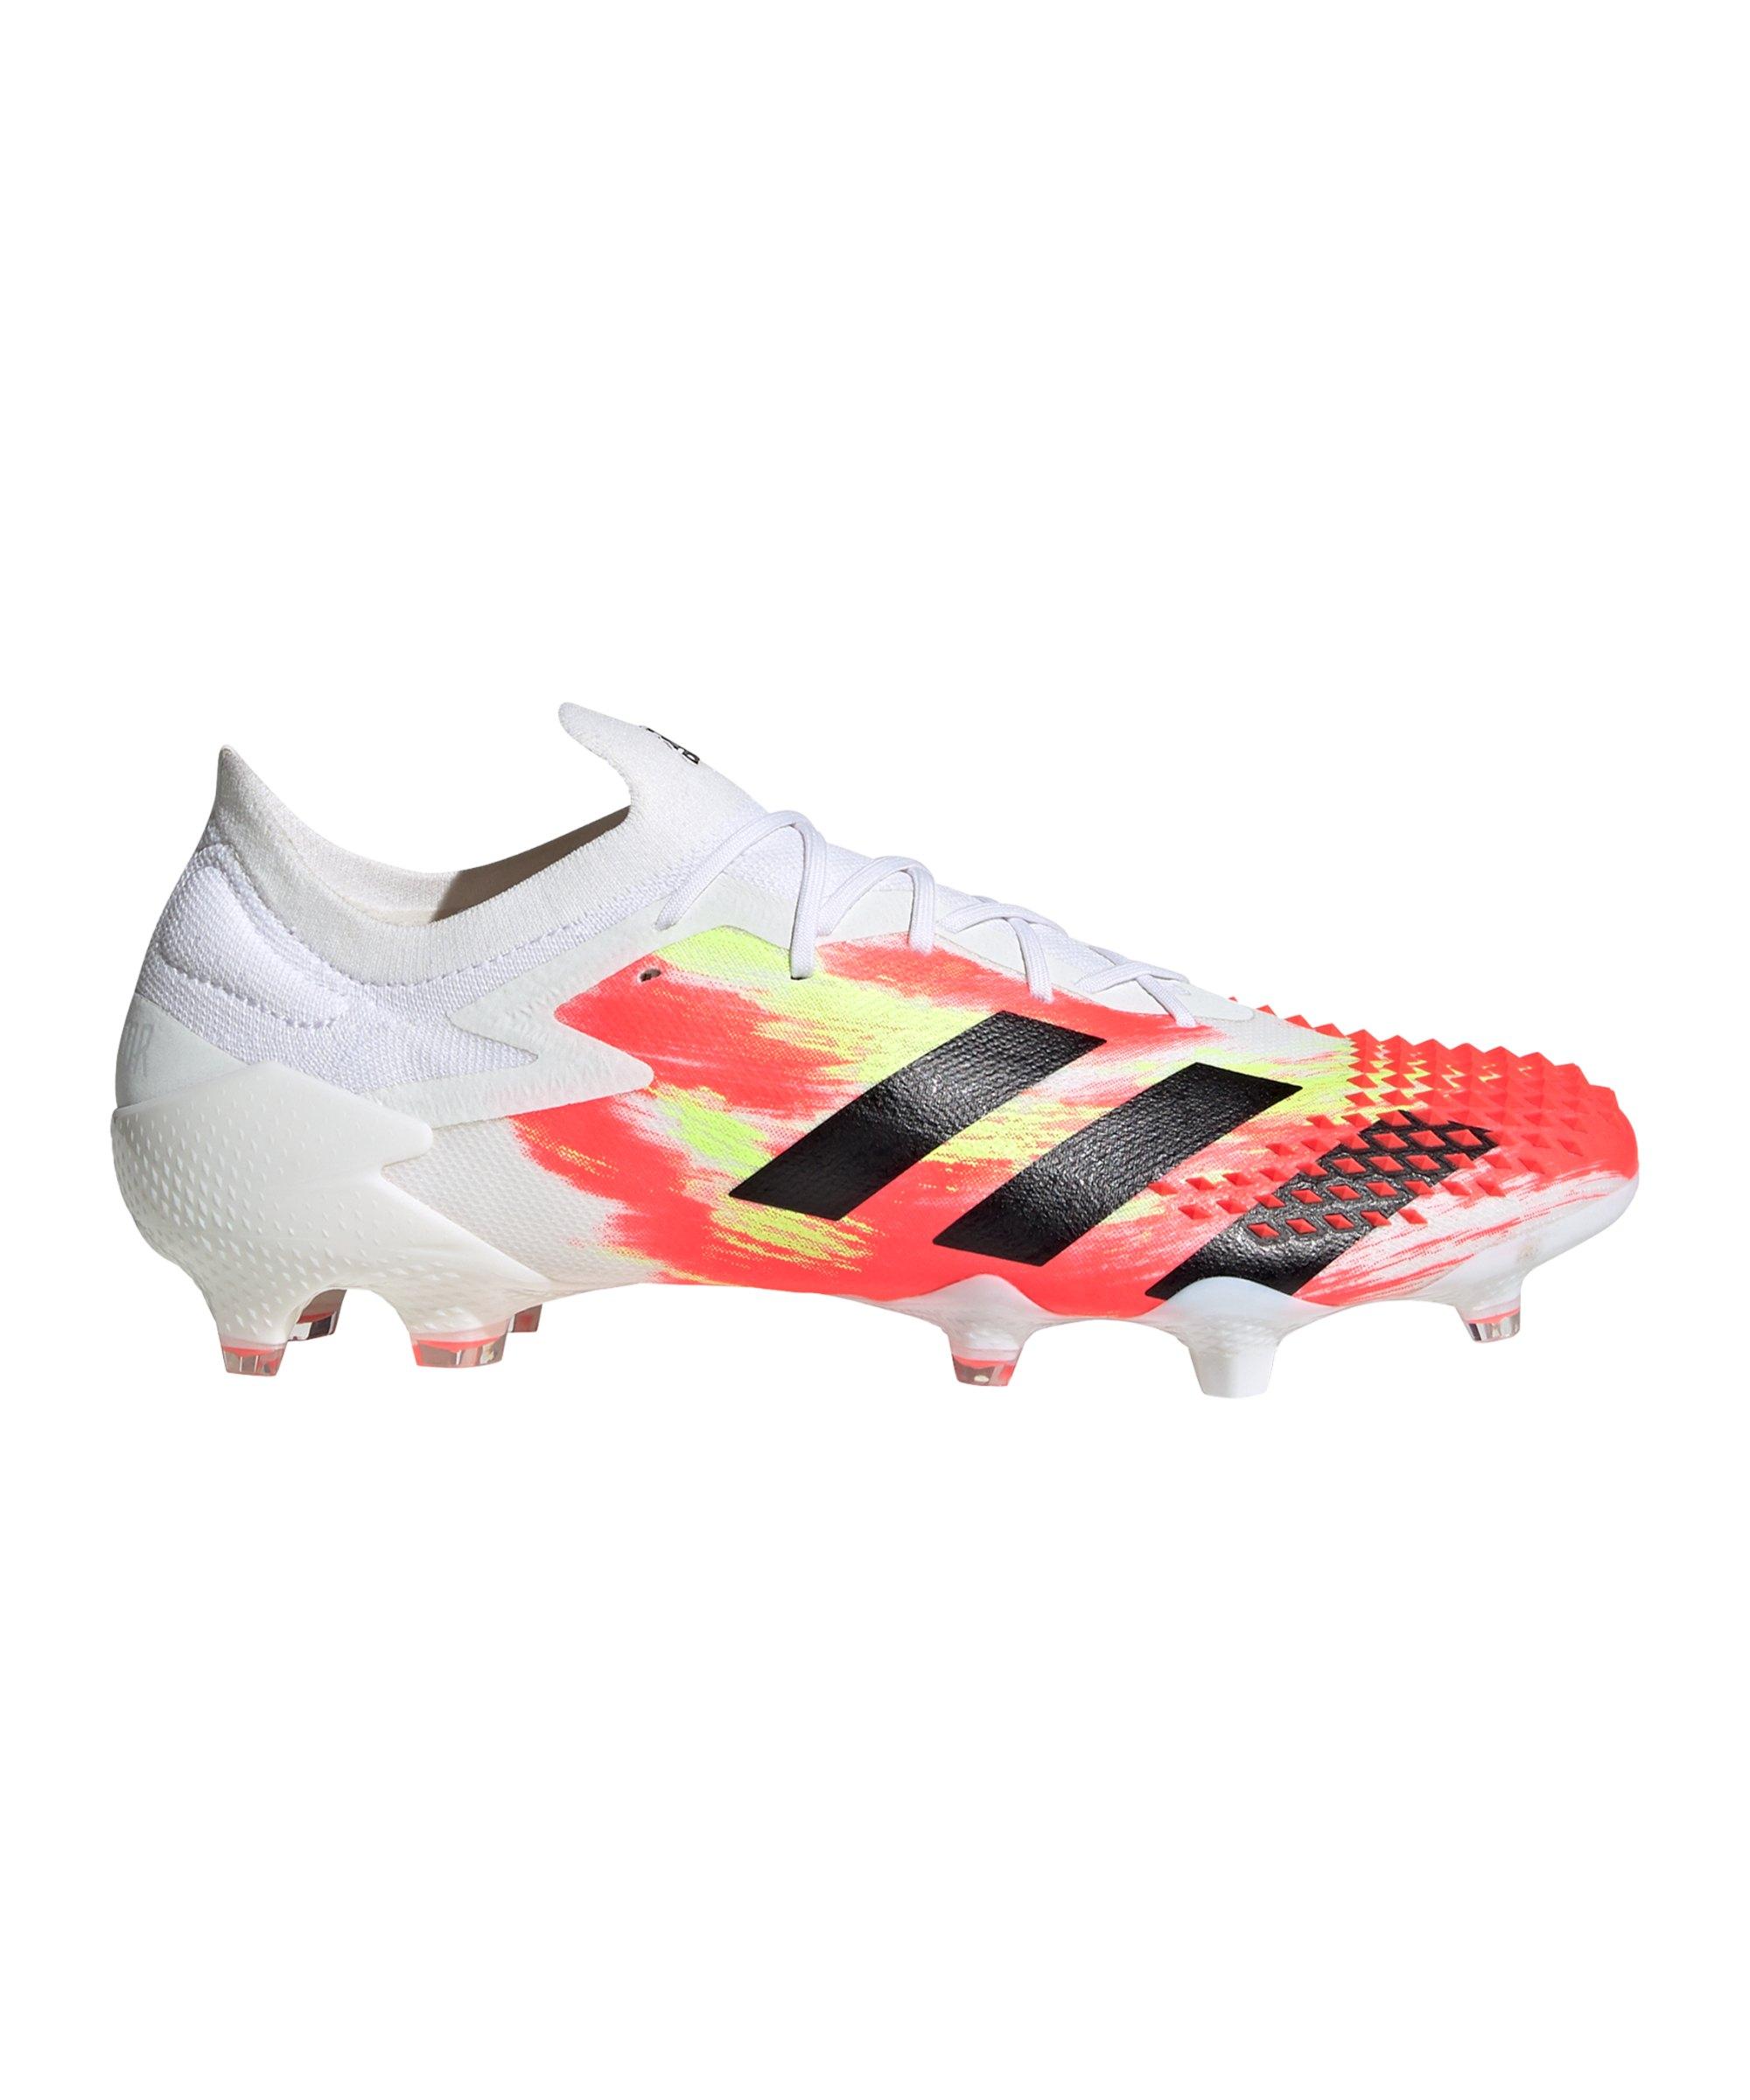 Adidas Predator Uniforia 20.1 L FG Weiss Rot Gelb